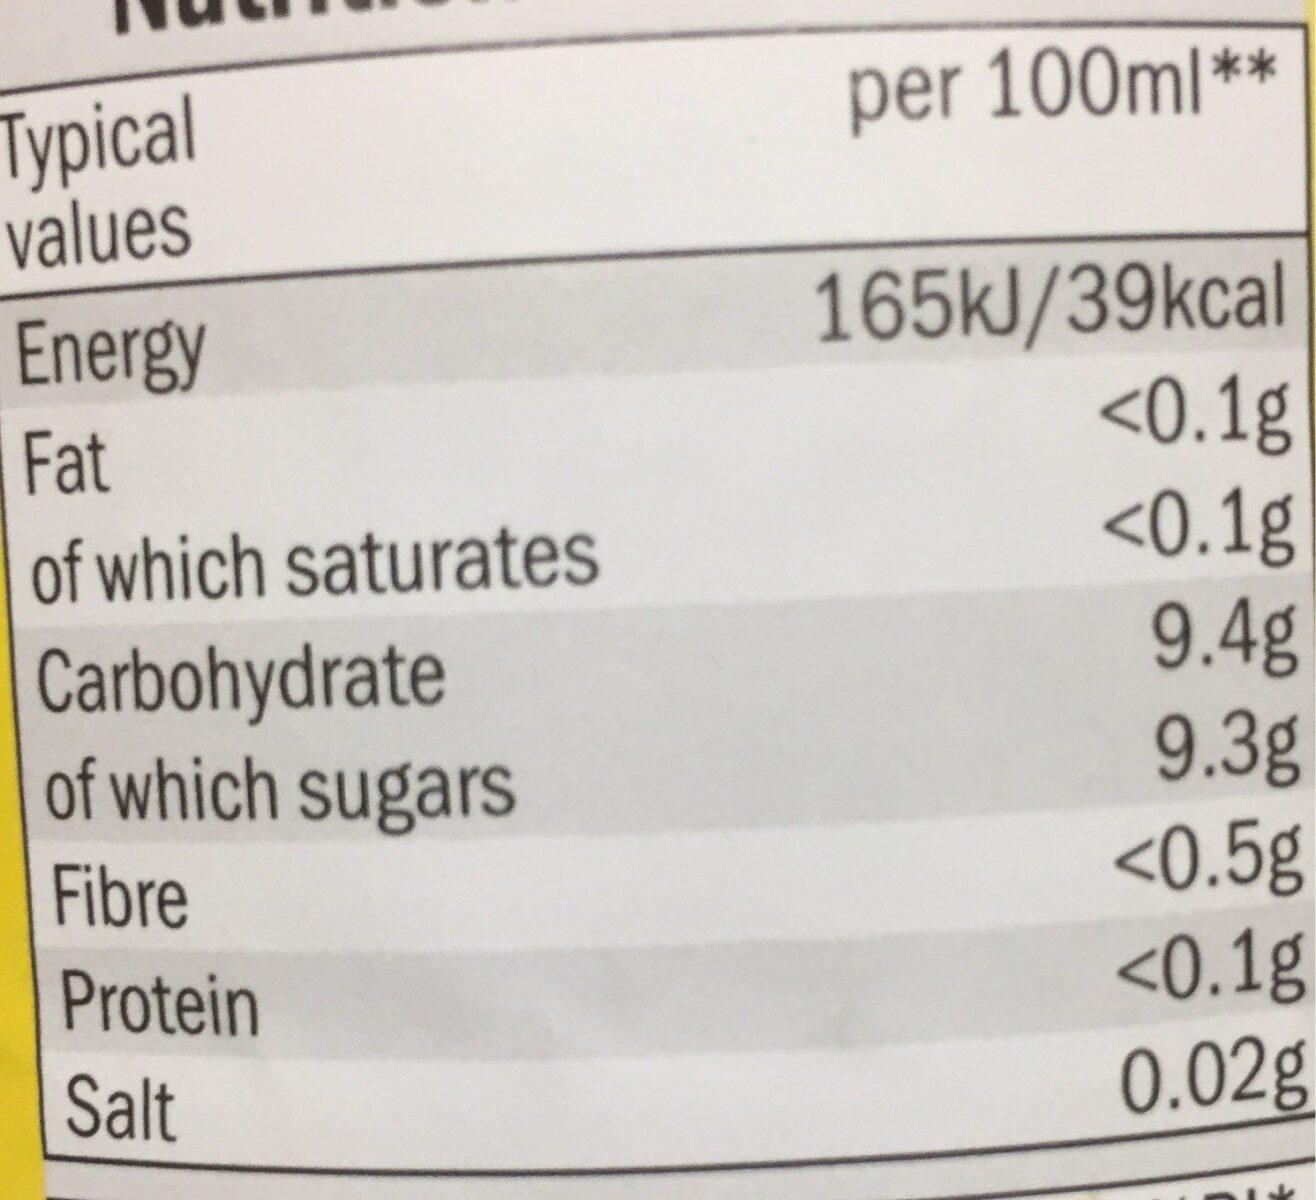 Lemon tea - Nutrition facts - en